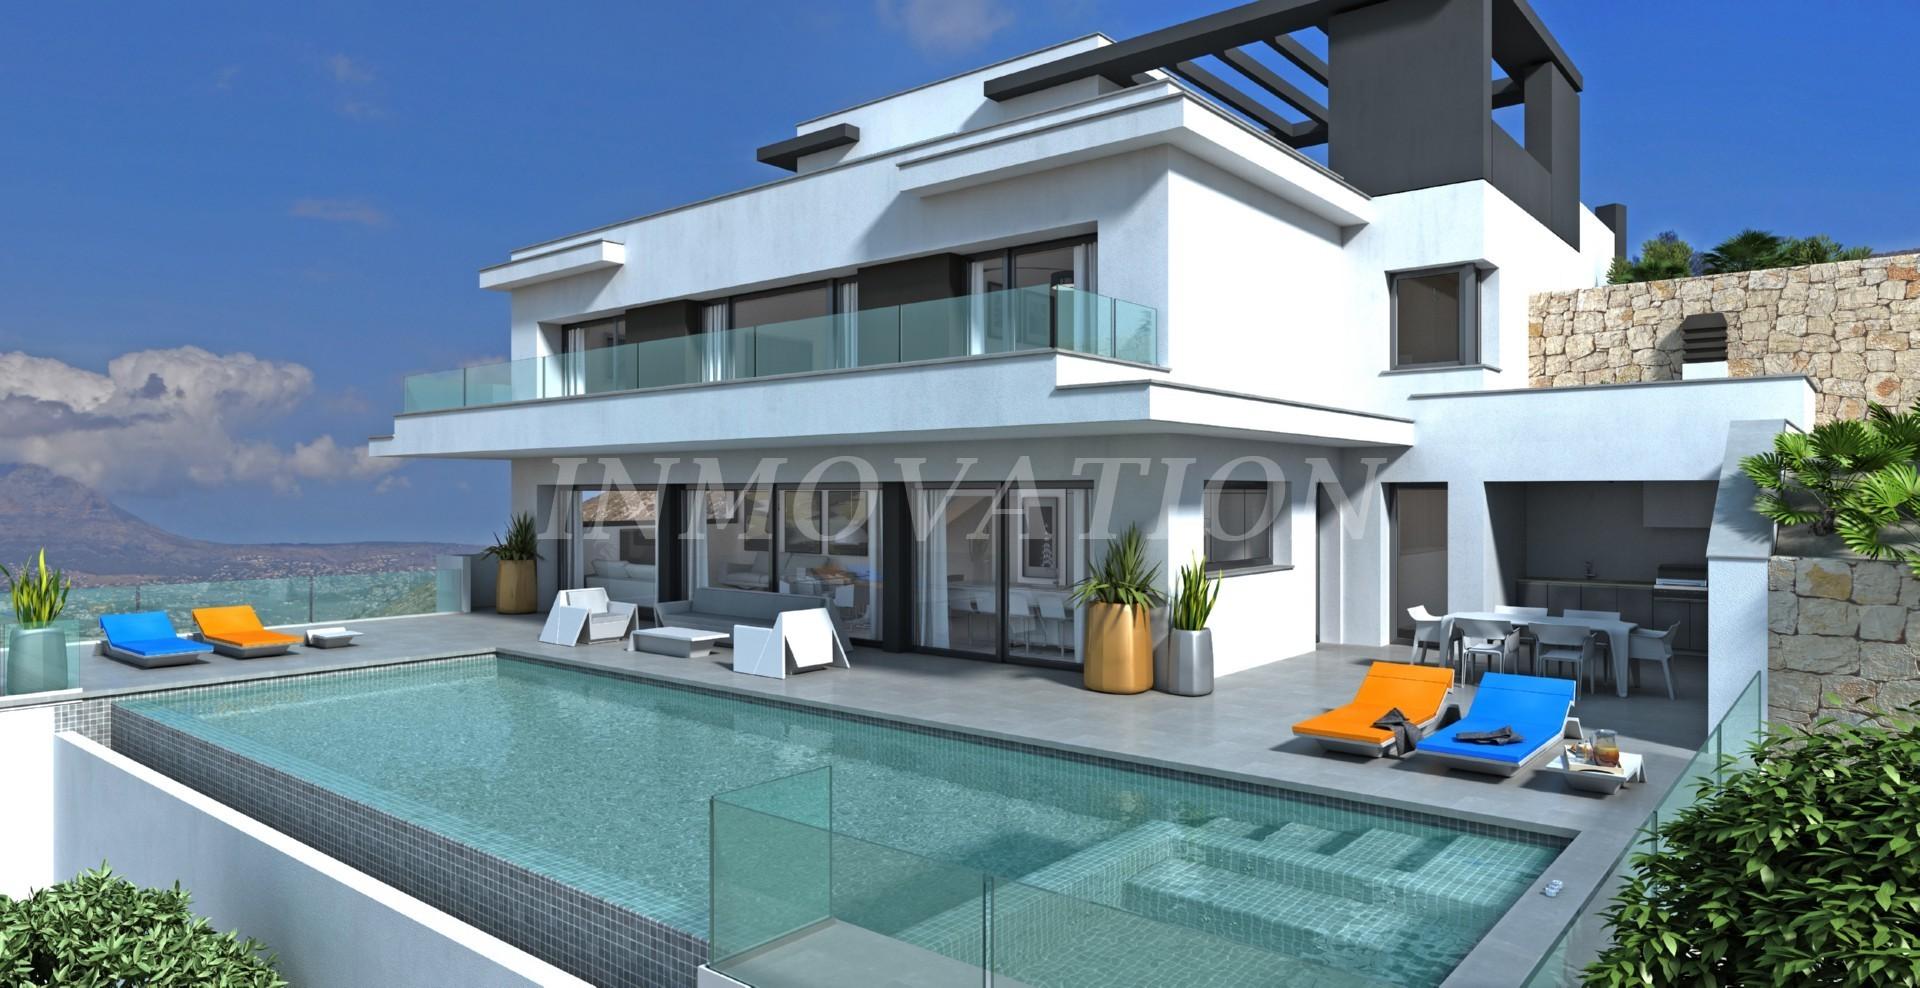 New Modern Villa Construction in Benitachell